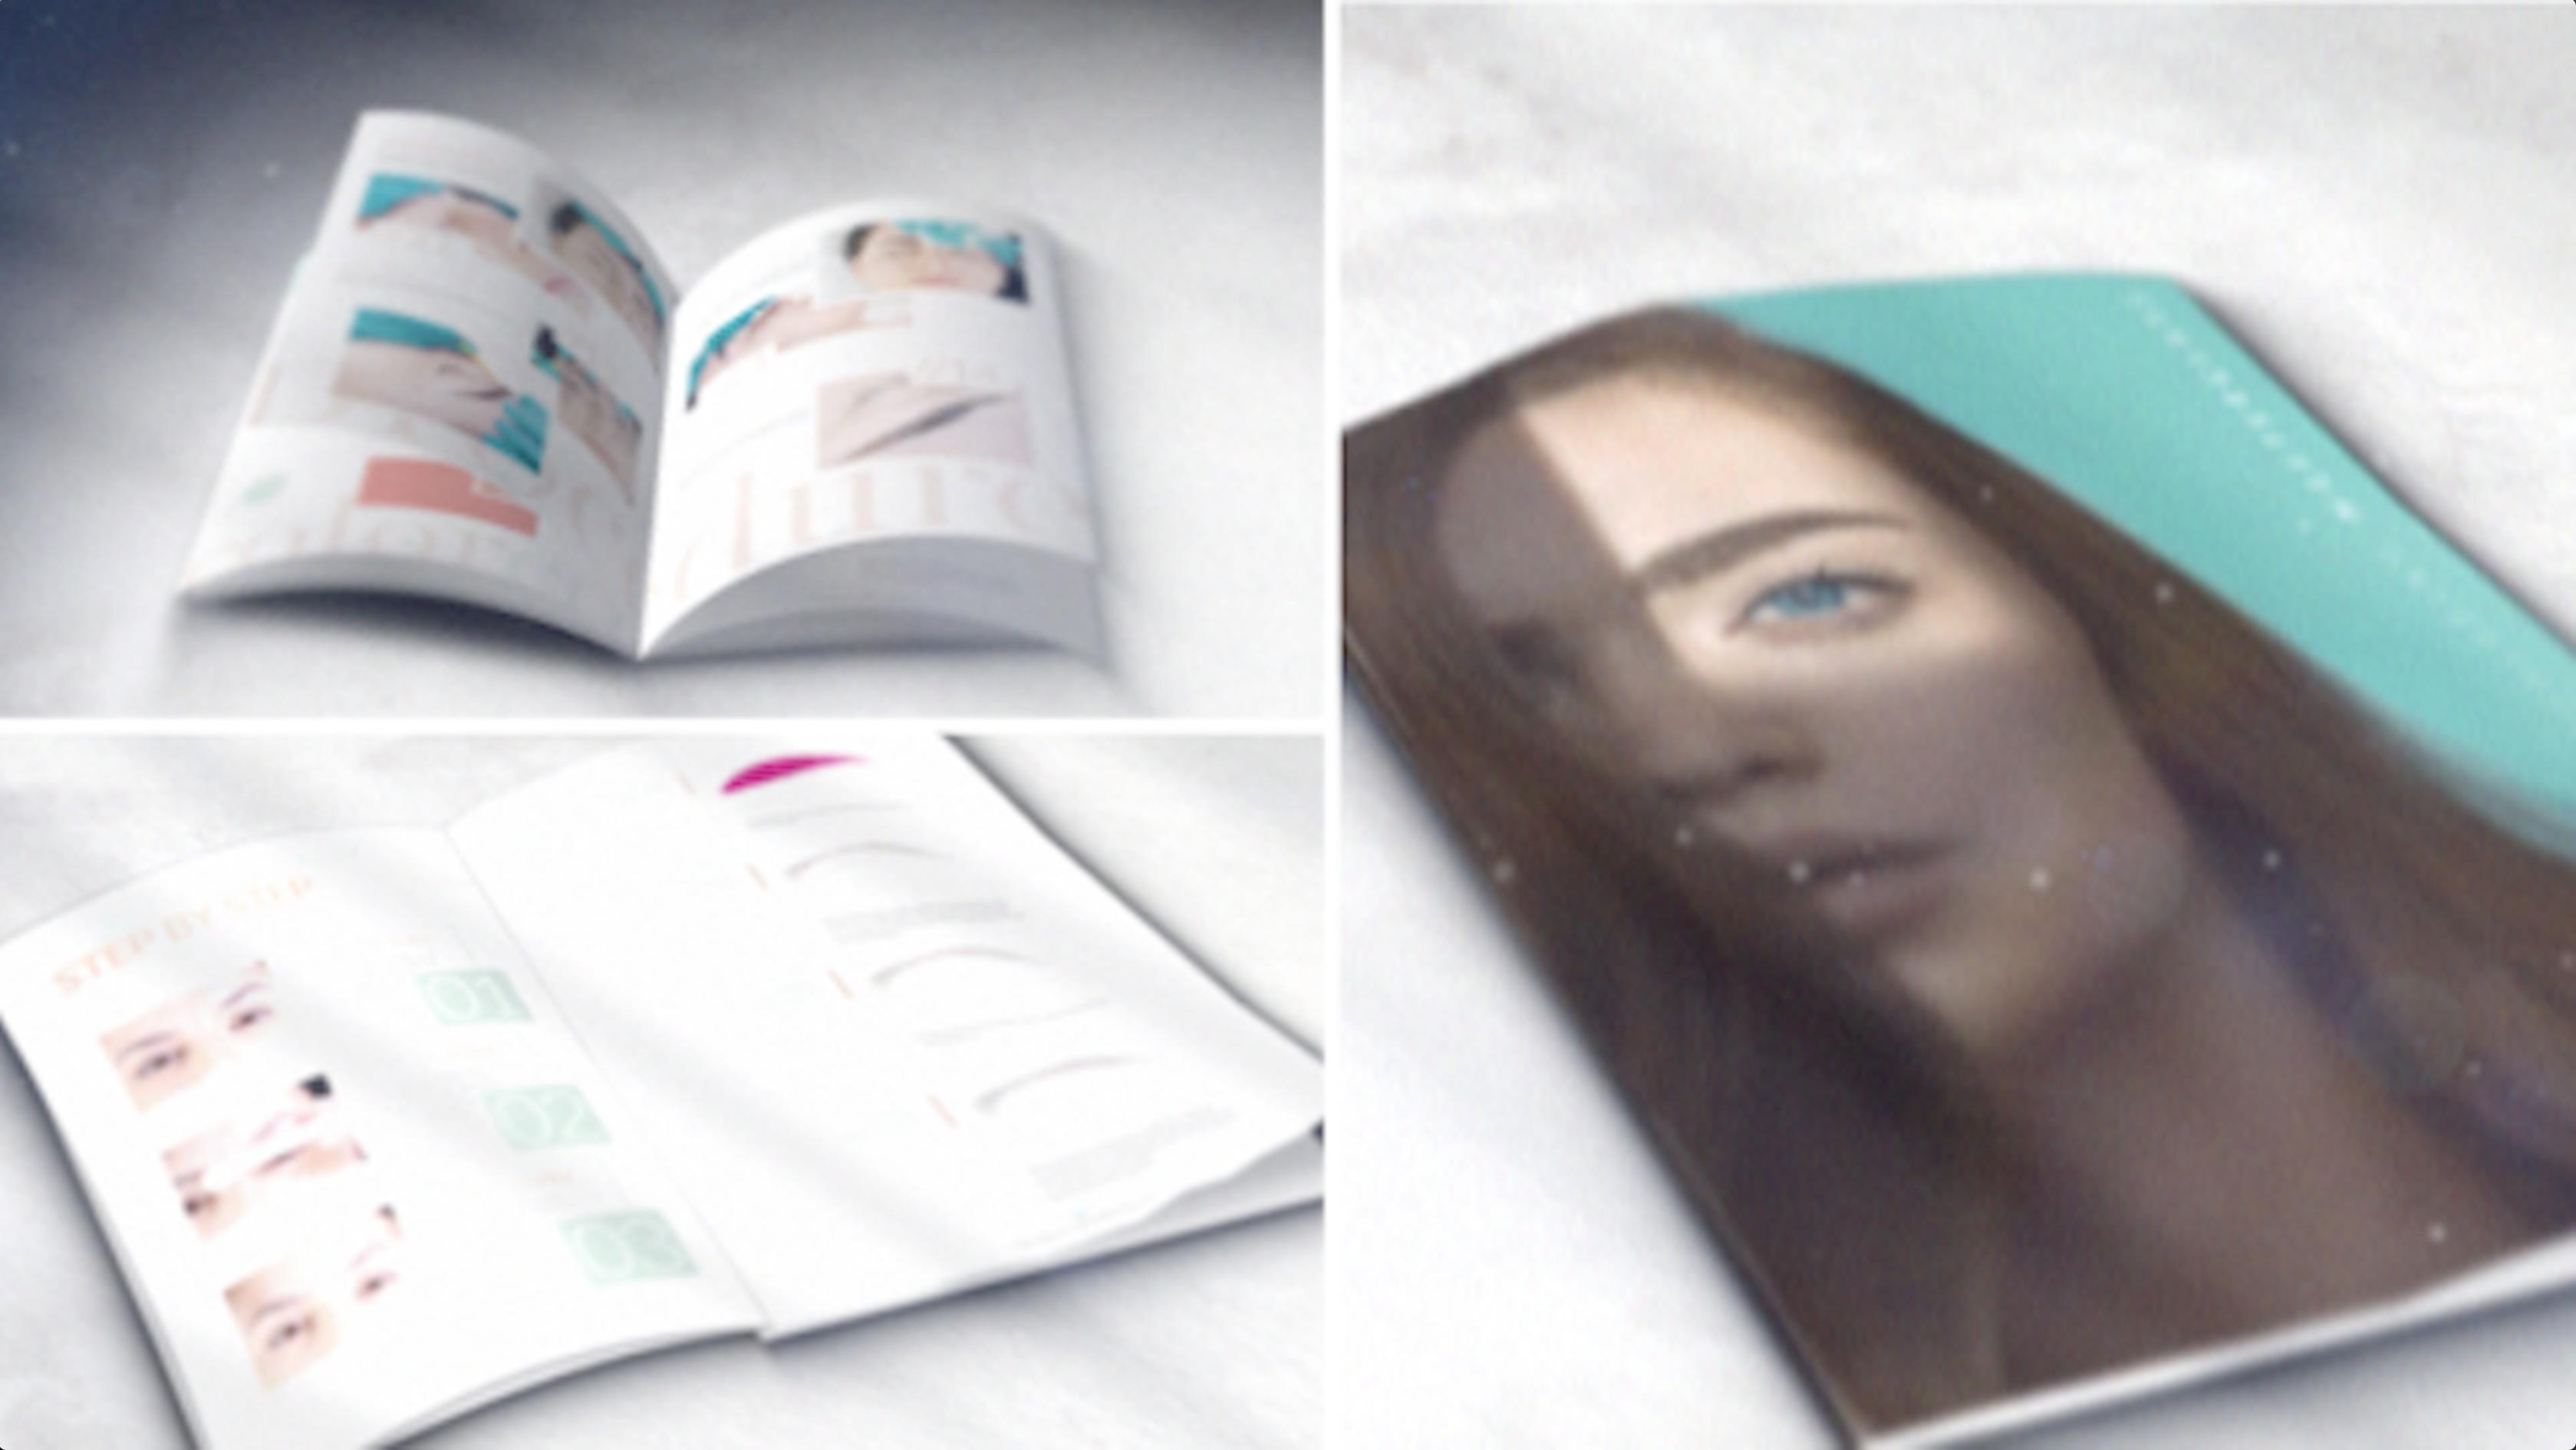 Dermacraft Microblading Book